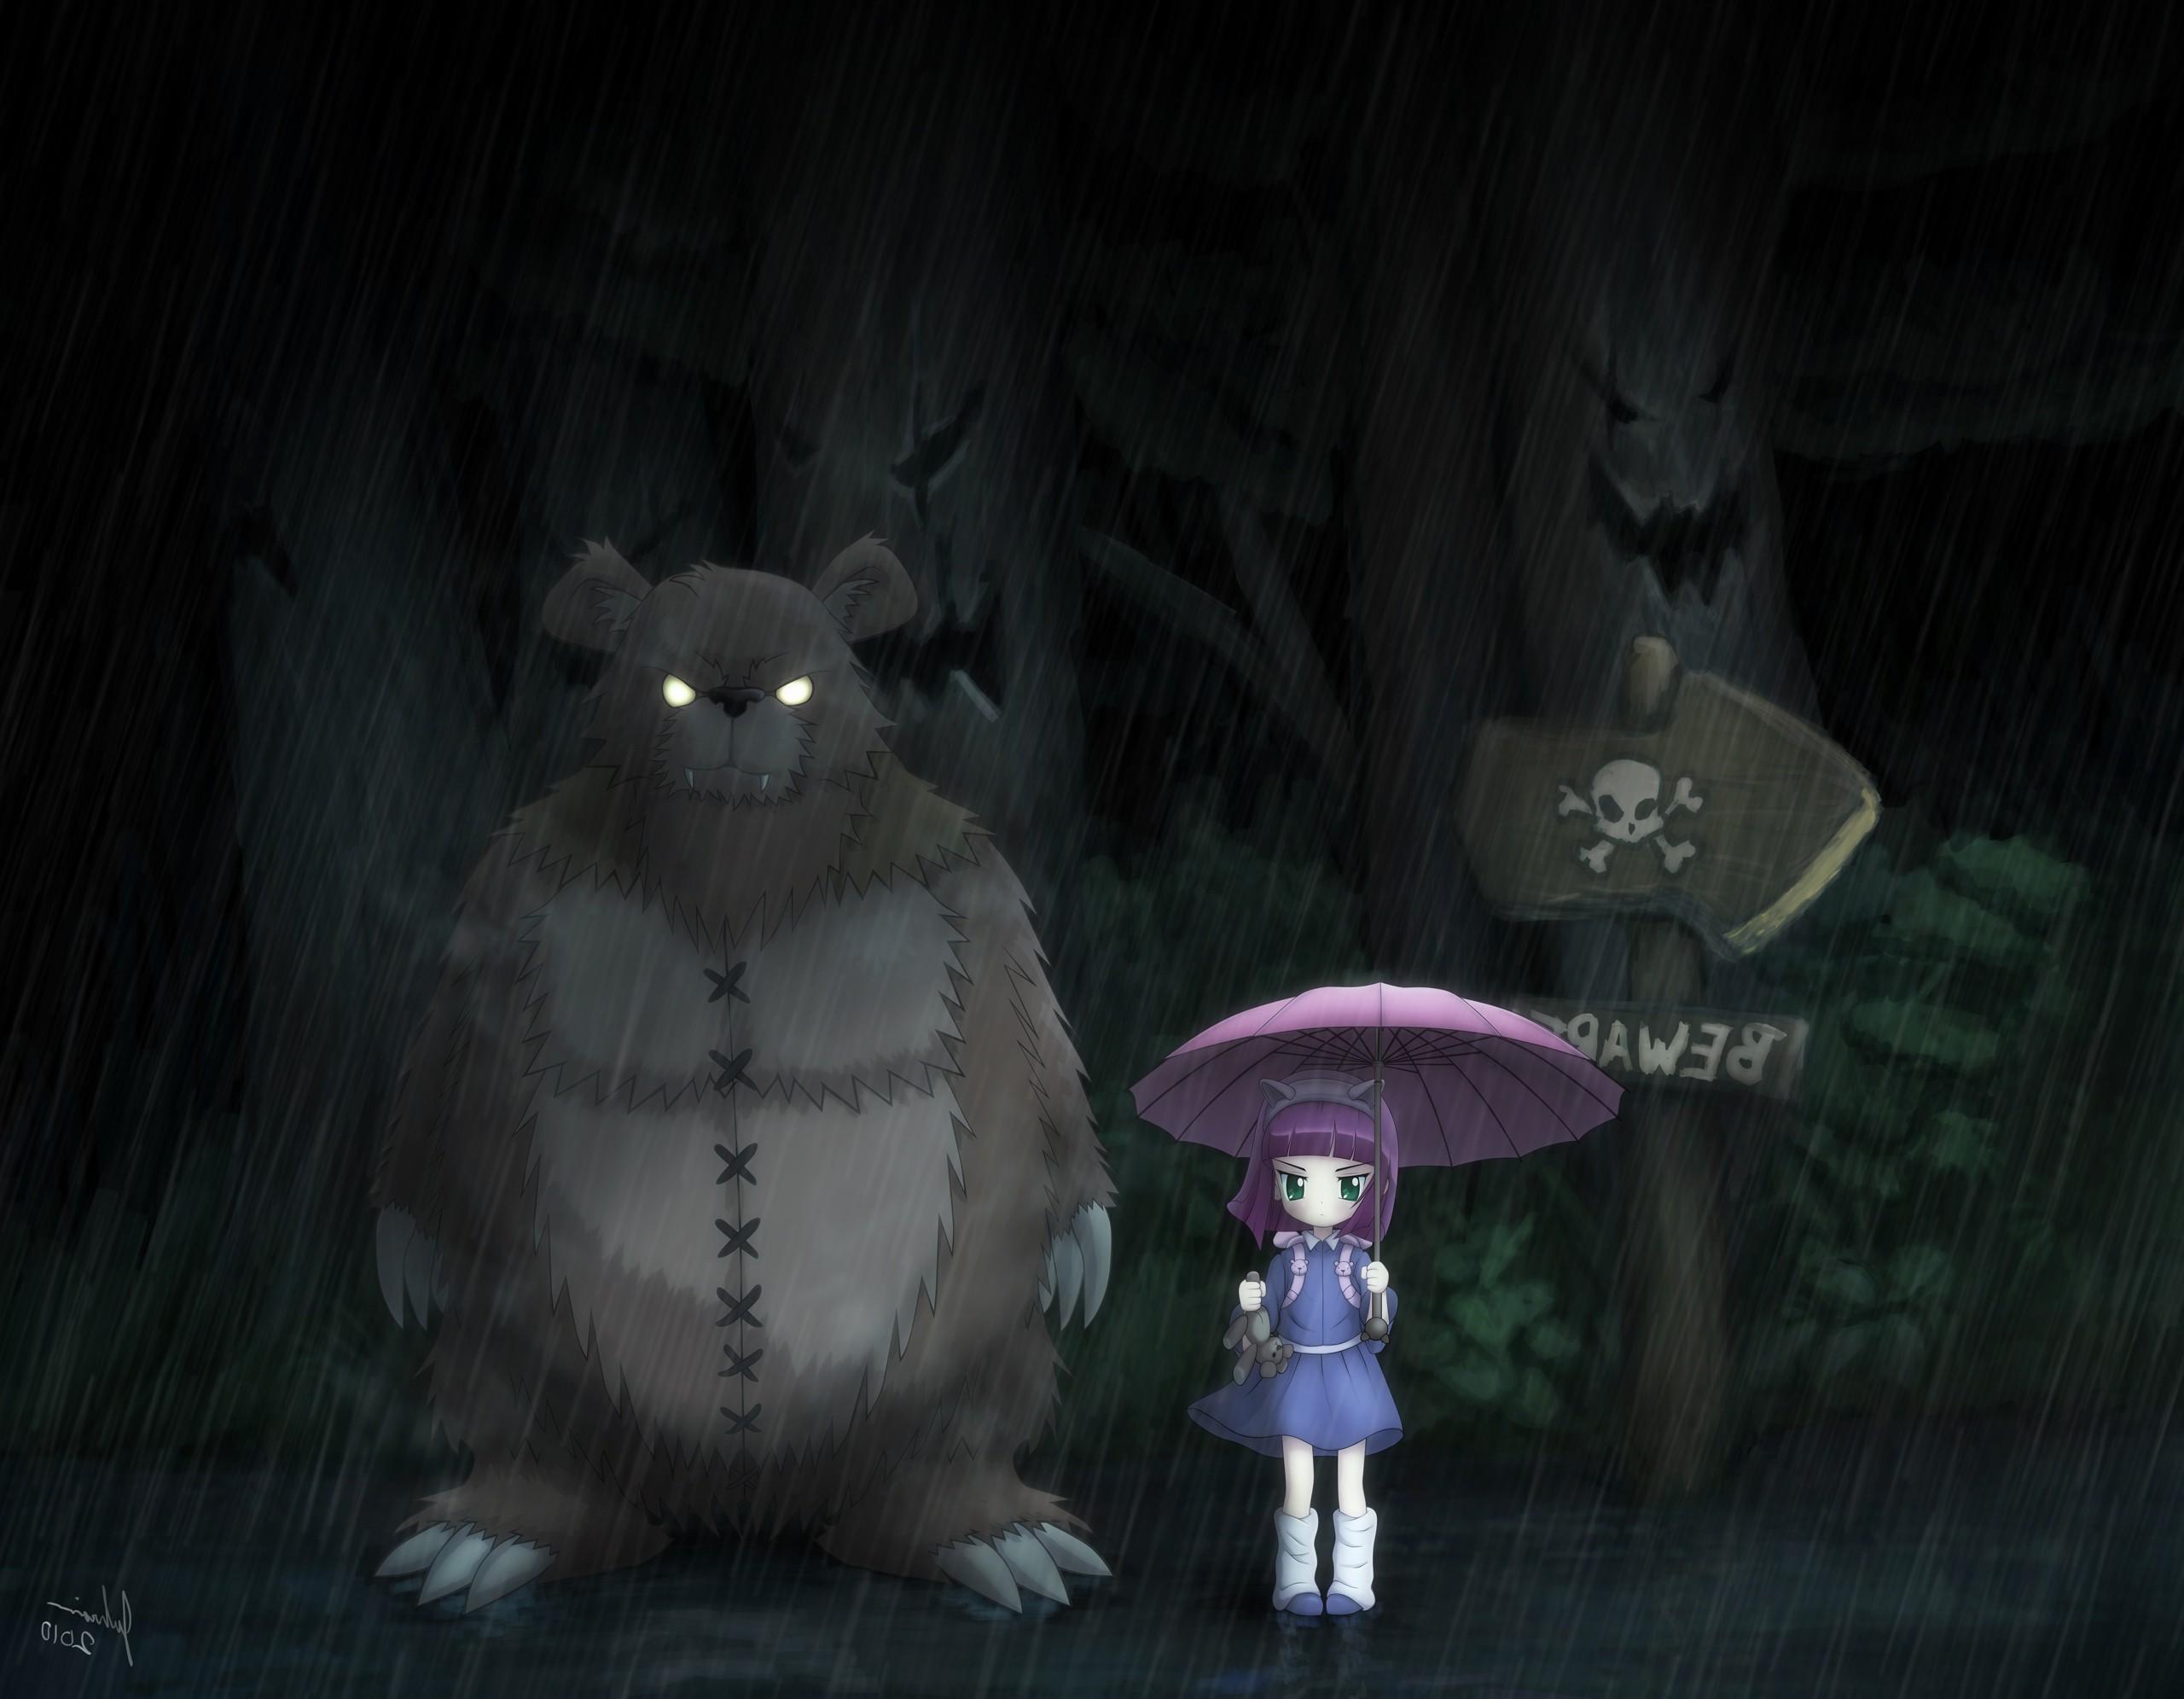 Video Games League Of Legends My Neighbor Totoro Annie Darkness Screenshot Computer Wallpaper 2560x1991 Px